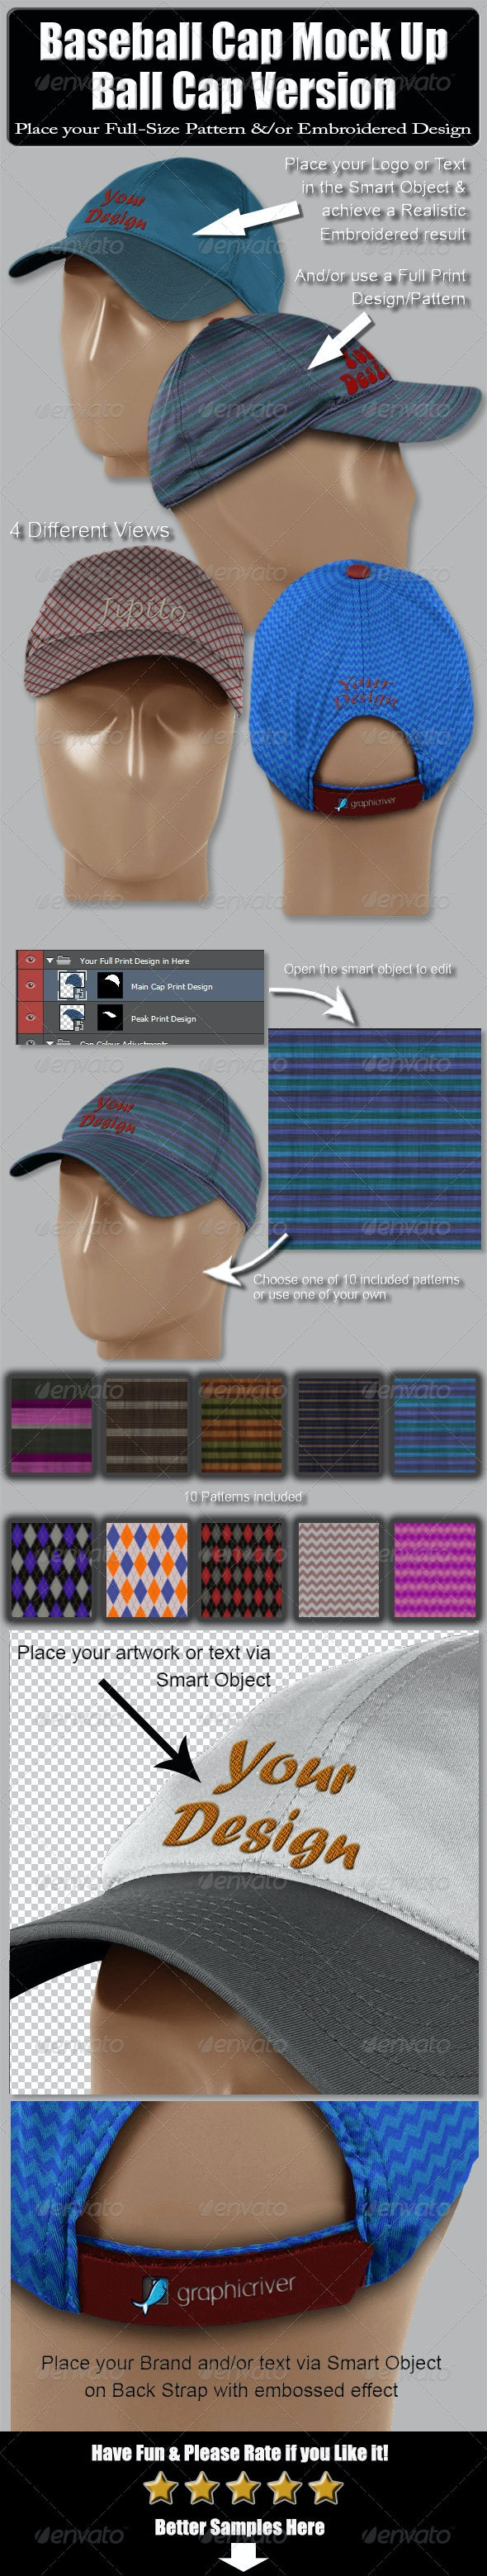 Baseball Cap Mock Up-Ball Cap Version - Miscellaneous Apparel